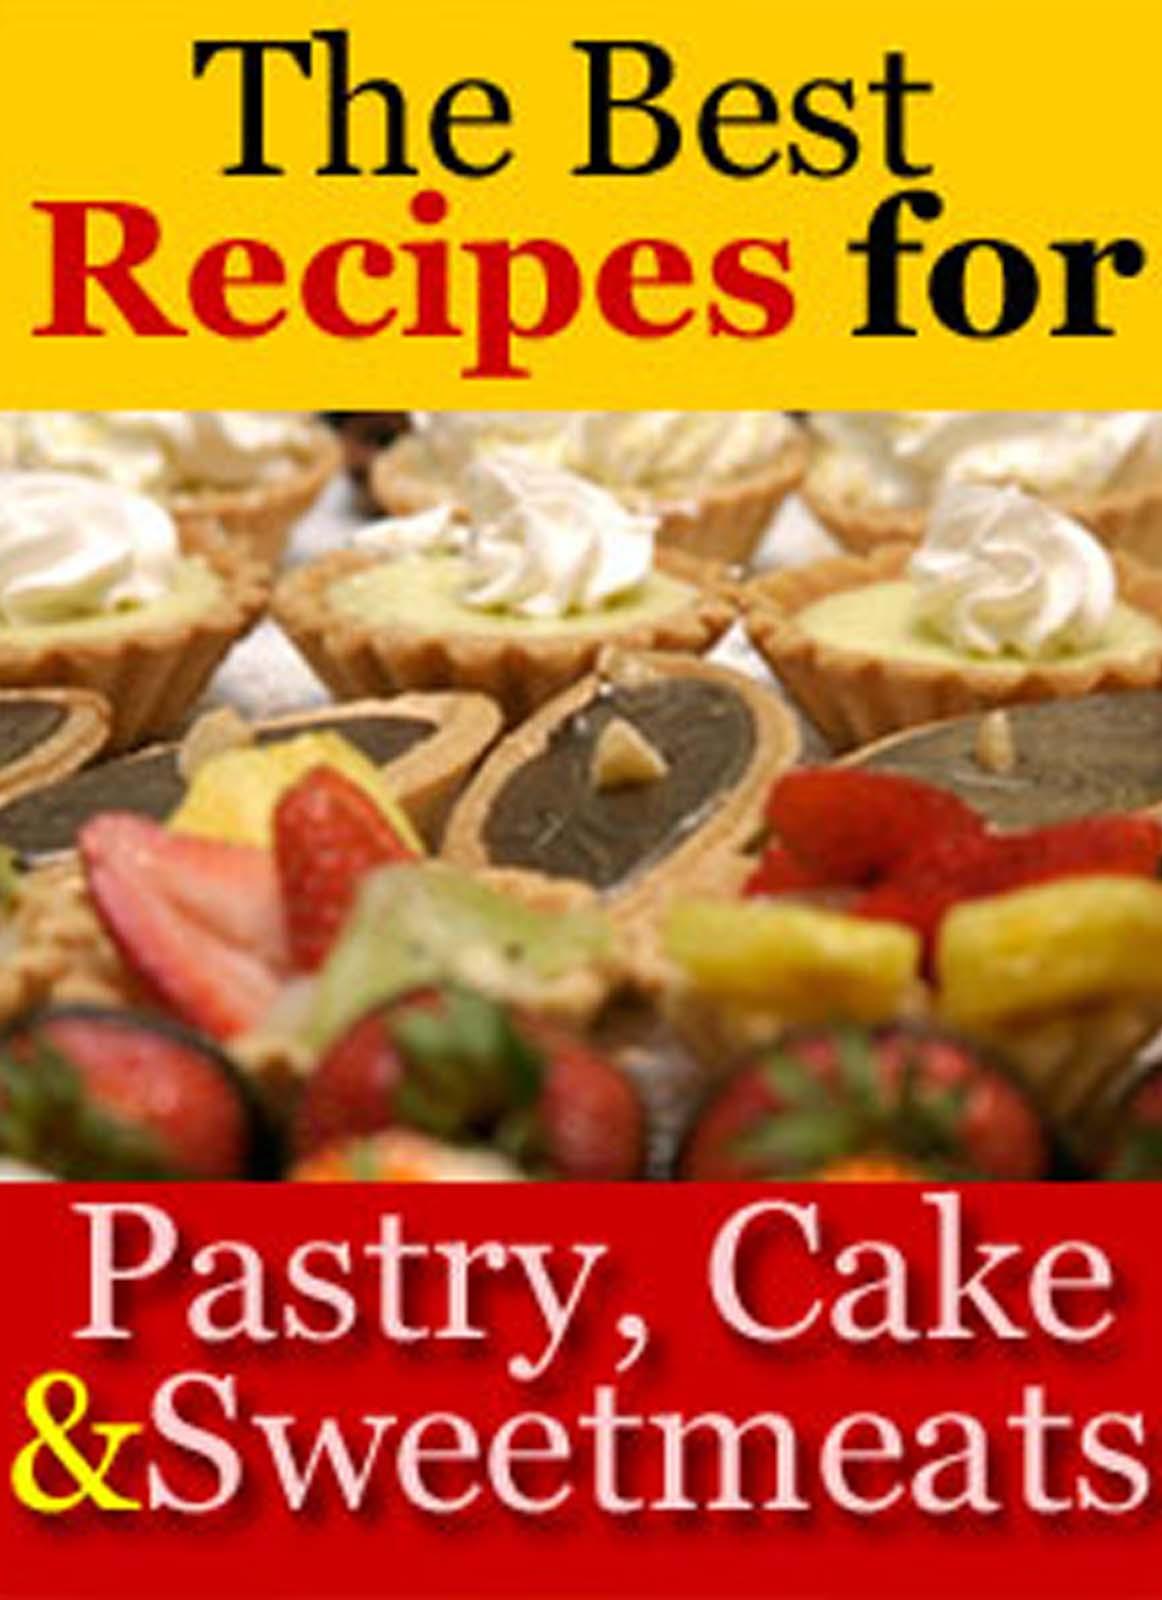 recipesforpastrycakeandsweetmeats-full